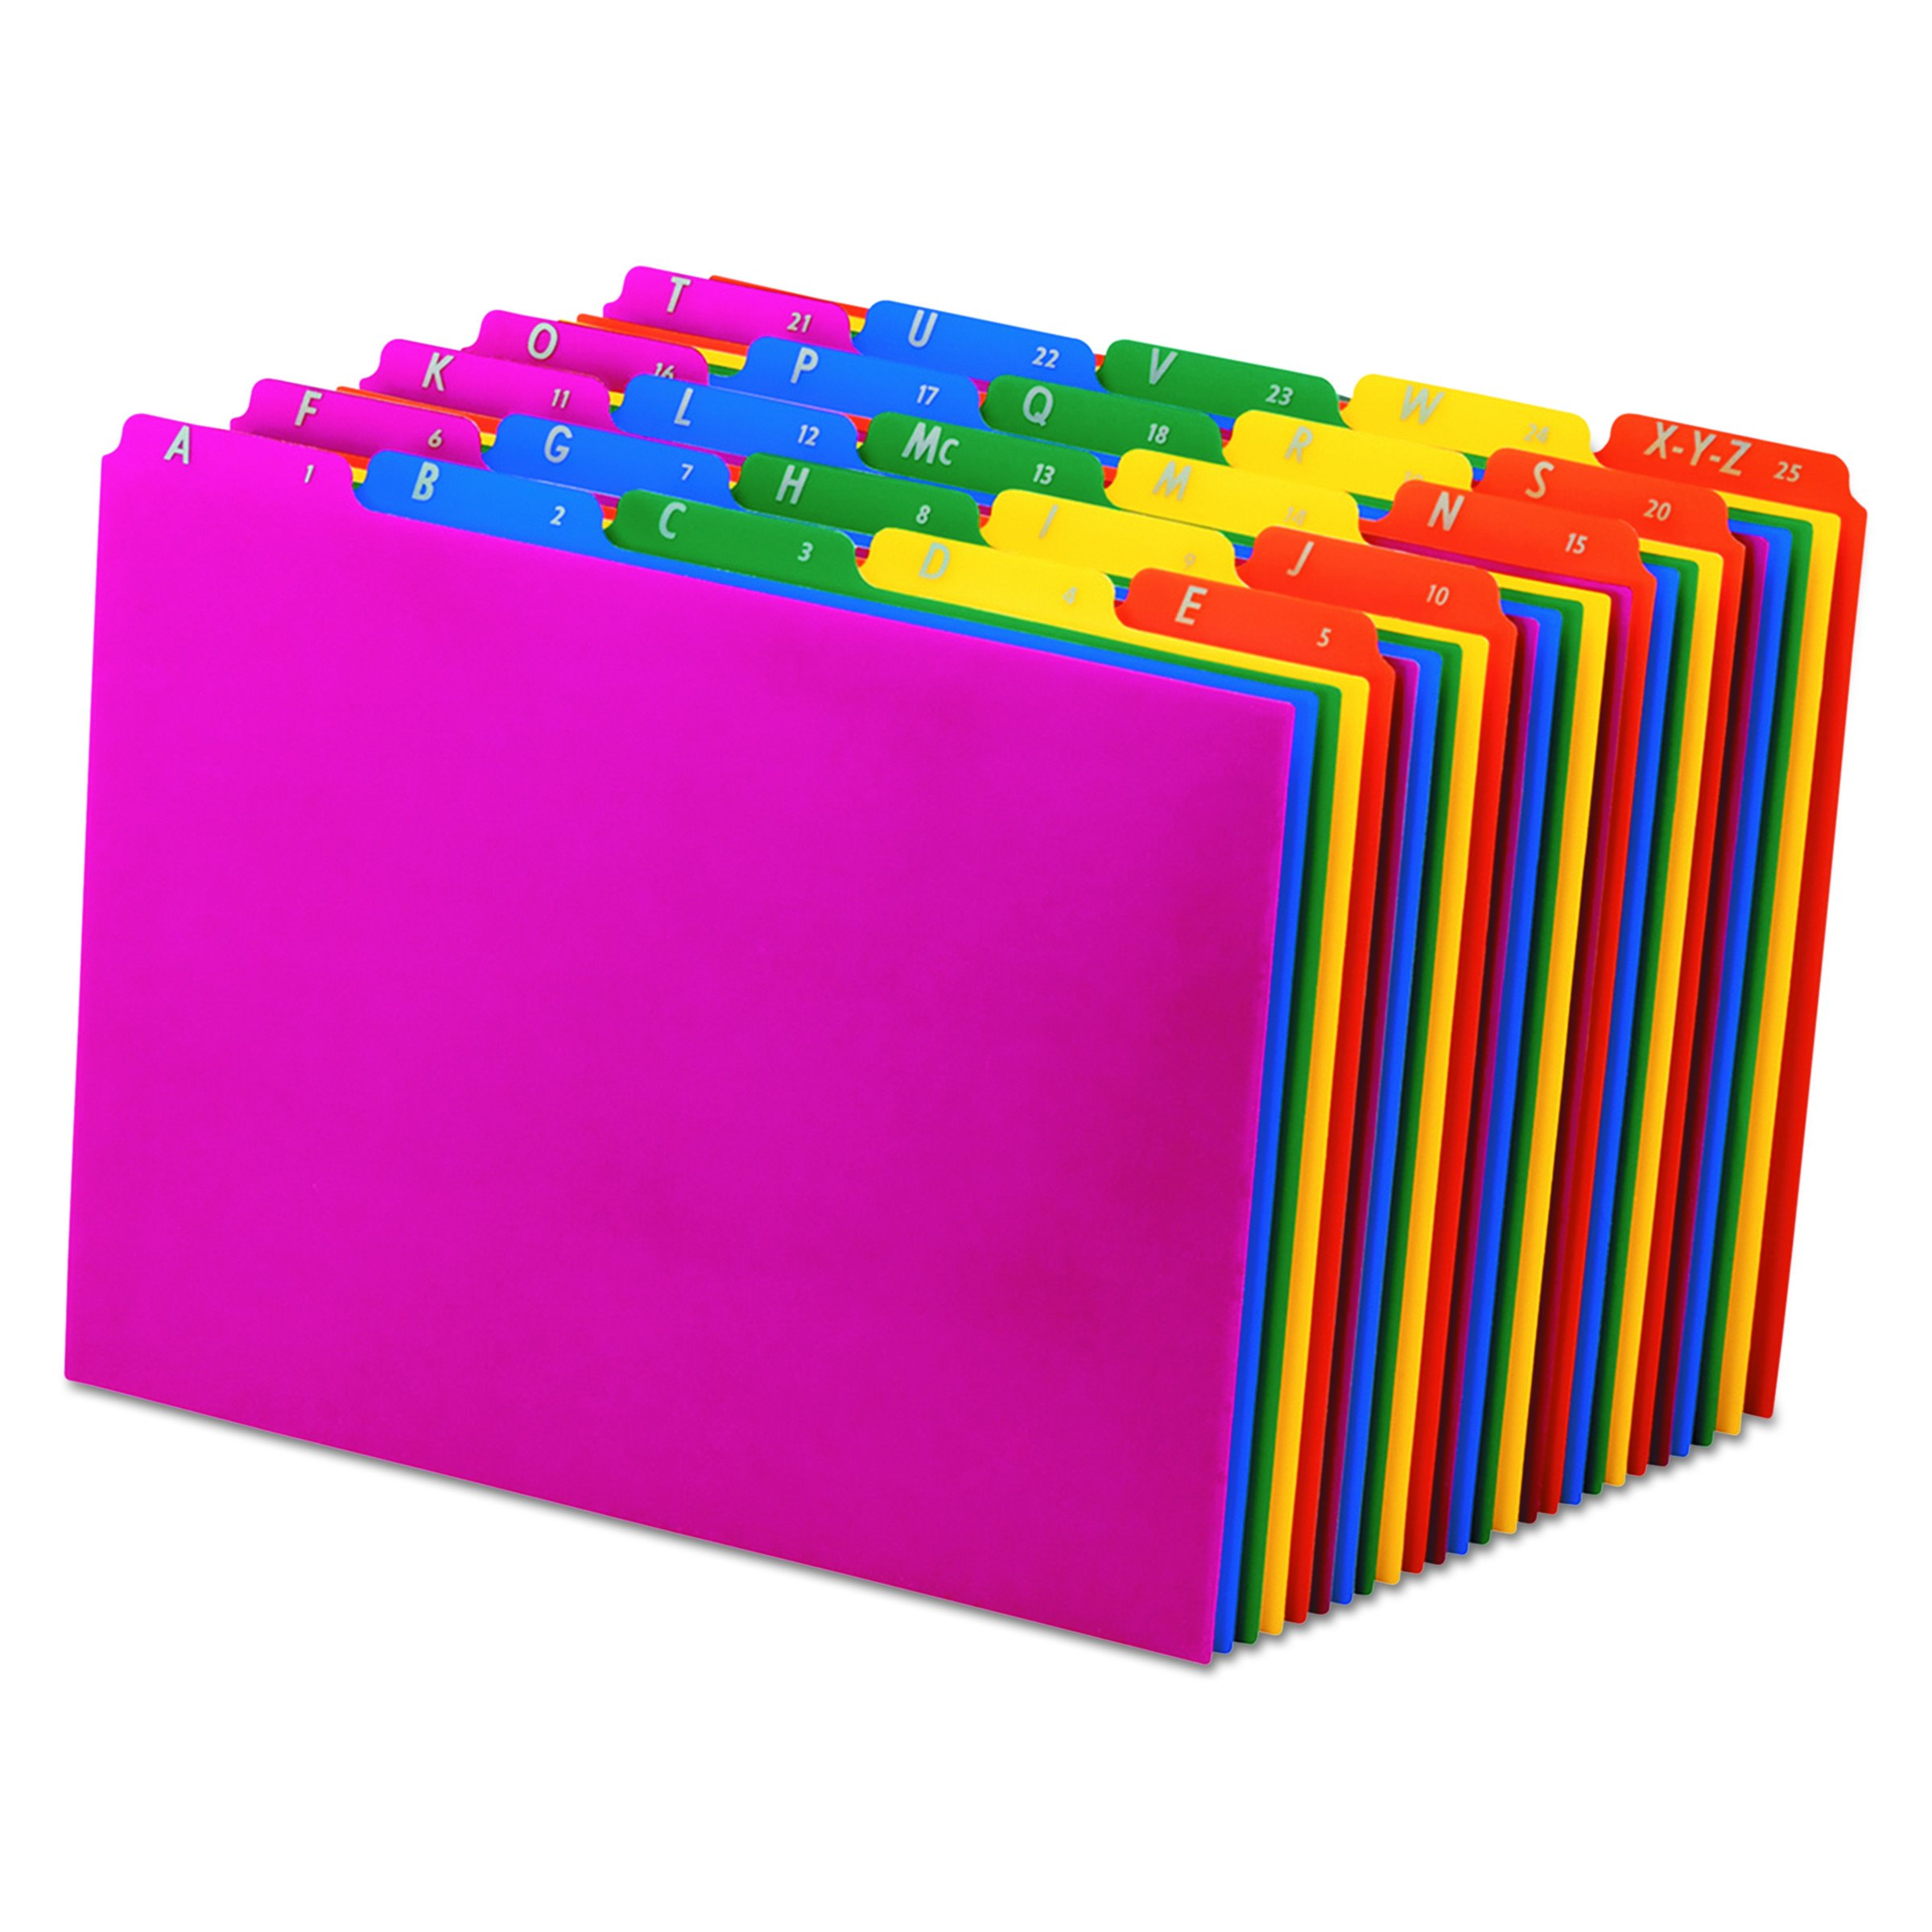 Amazon.com : Pendaflex 40142 Top Tab File Guides, Alpha/A-Z 1/5 Tab ...